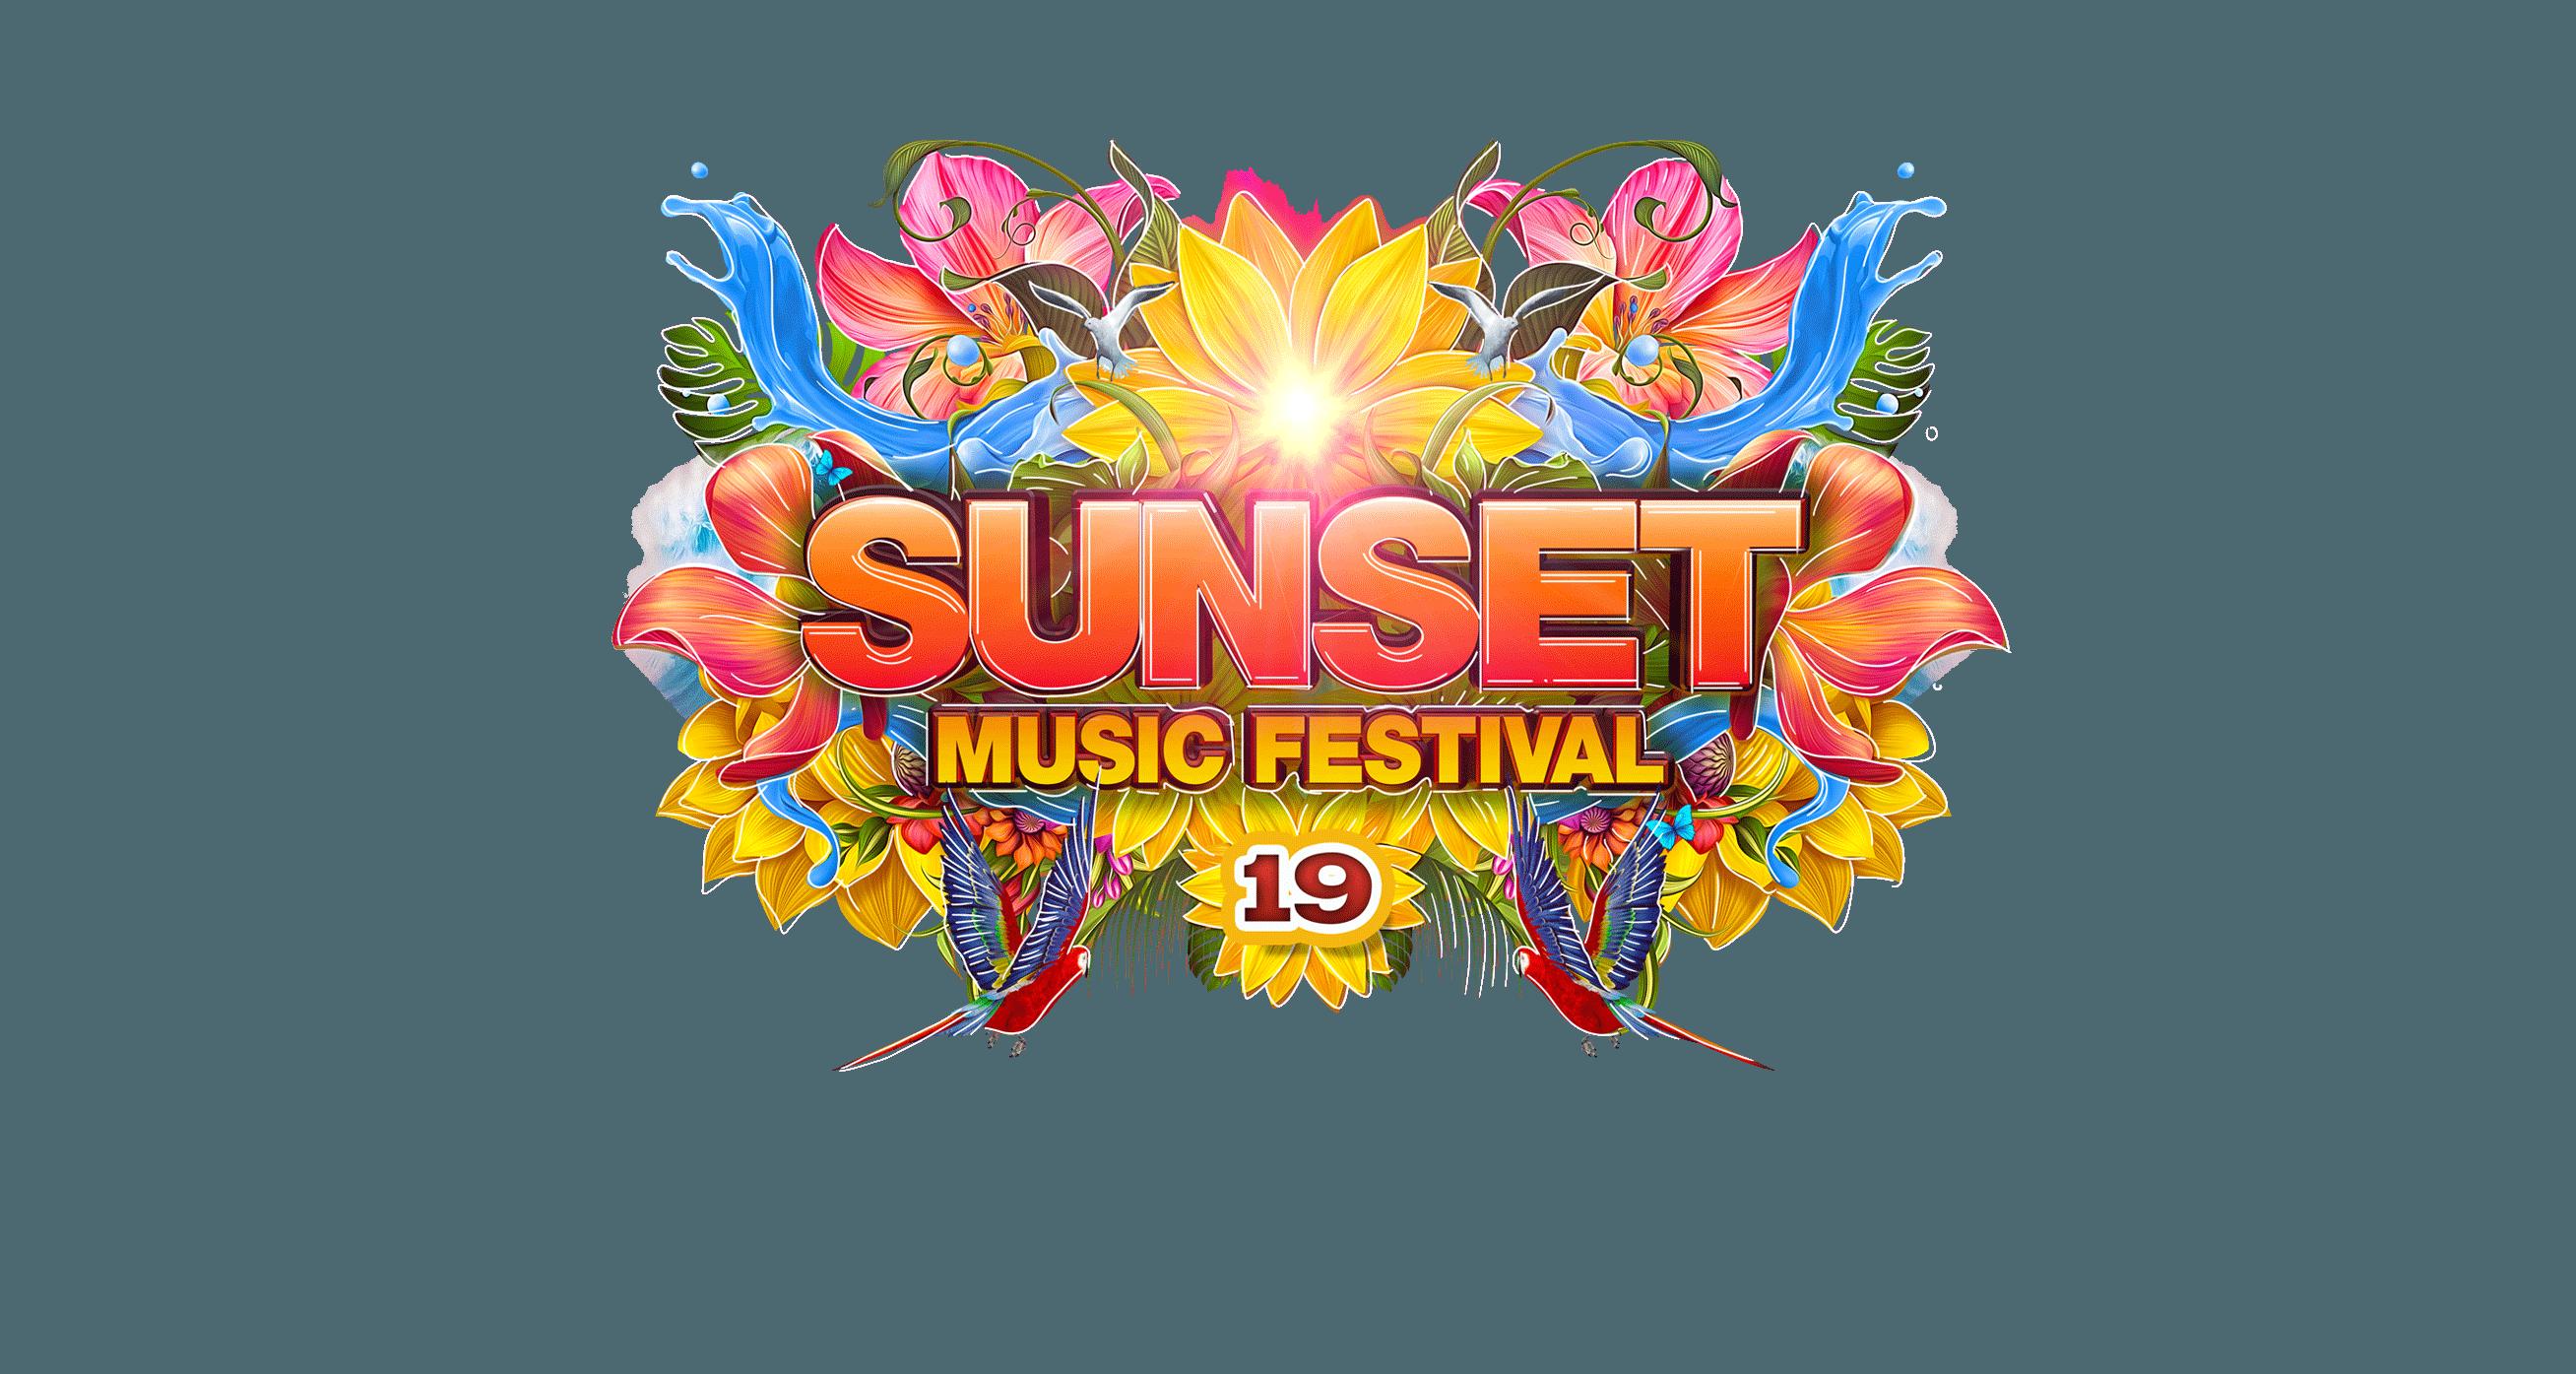 Sunset Sunset Music Festival Sunset music festival